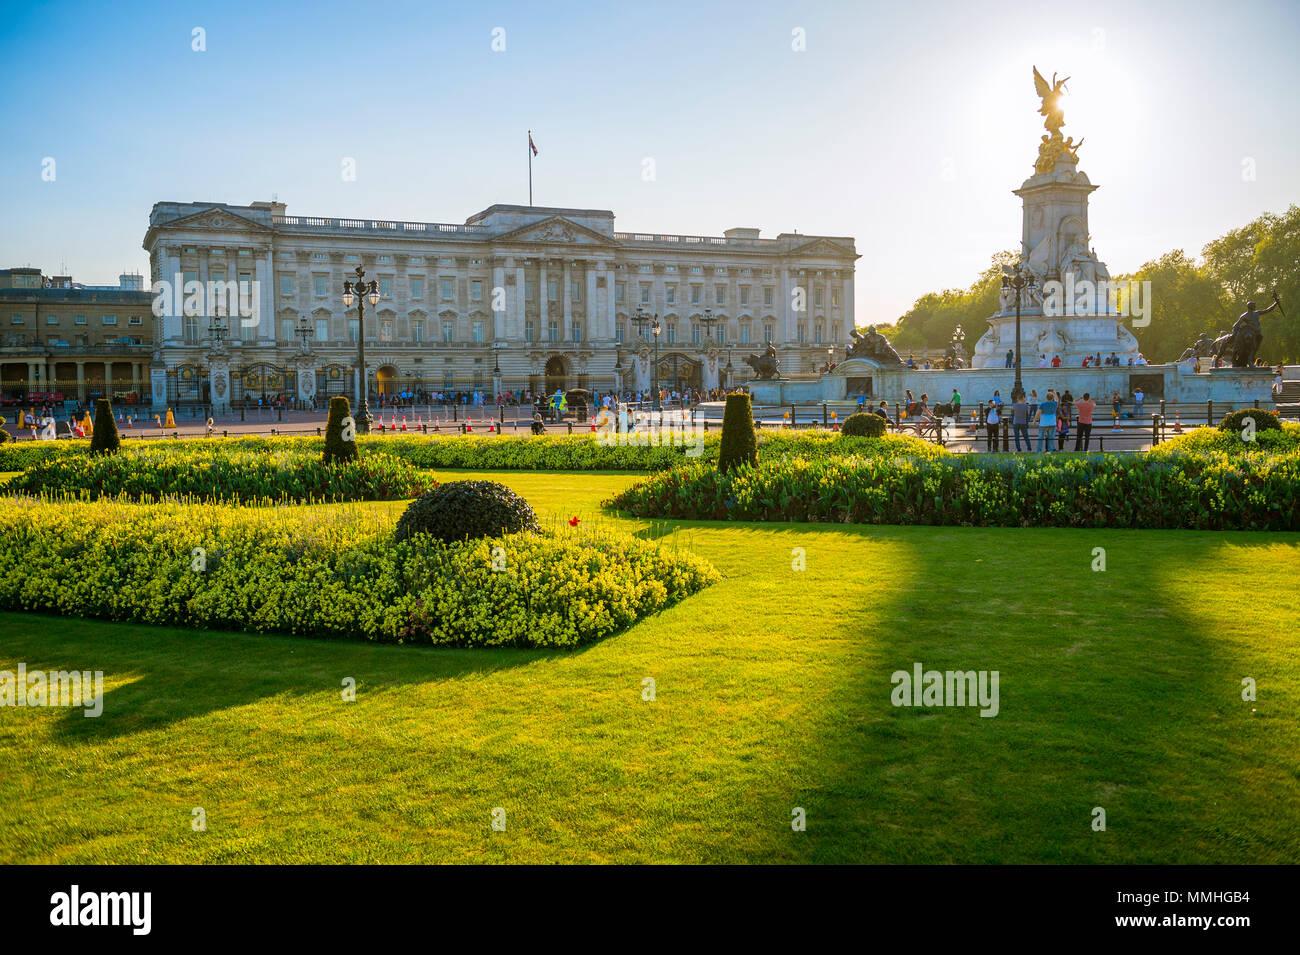 LONDON - Mai 7, 2018: Blick über die Blumenbeete vor dem Buckingham Palace bei Sonnenuntergang. Stockbild